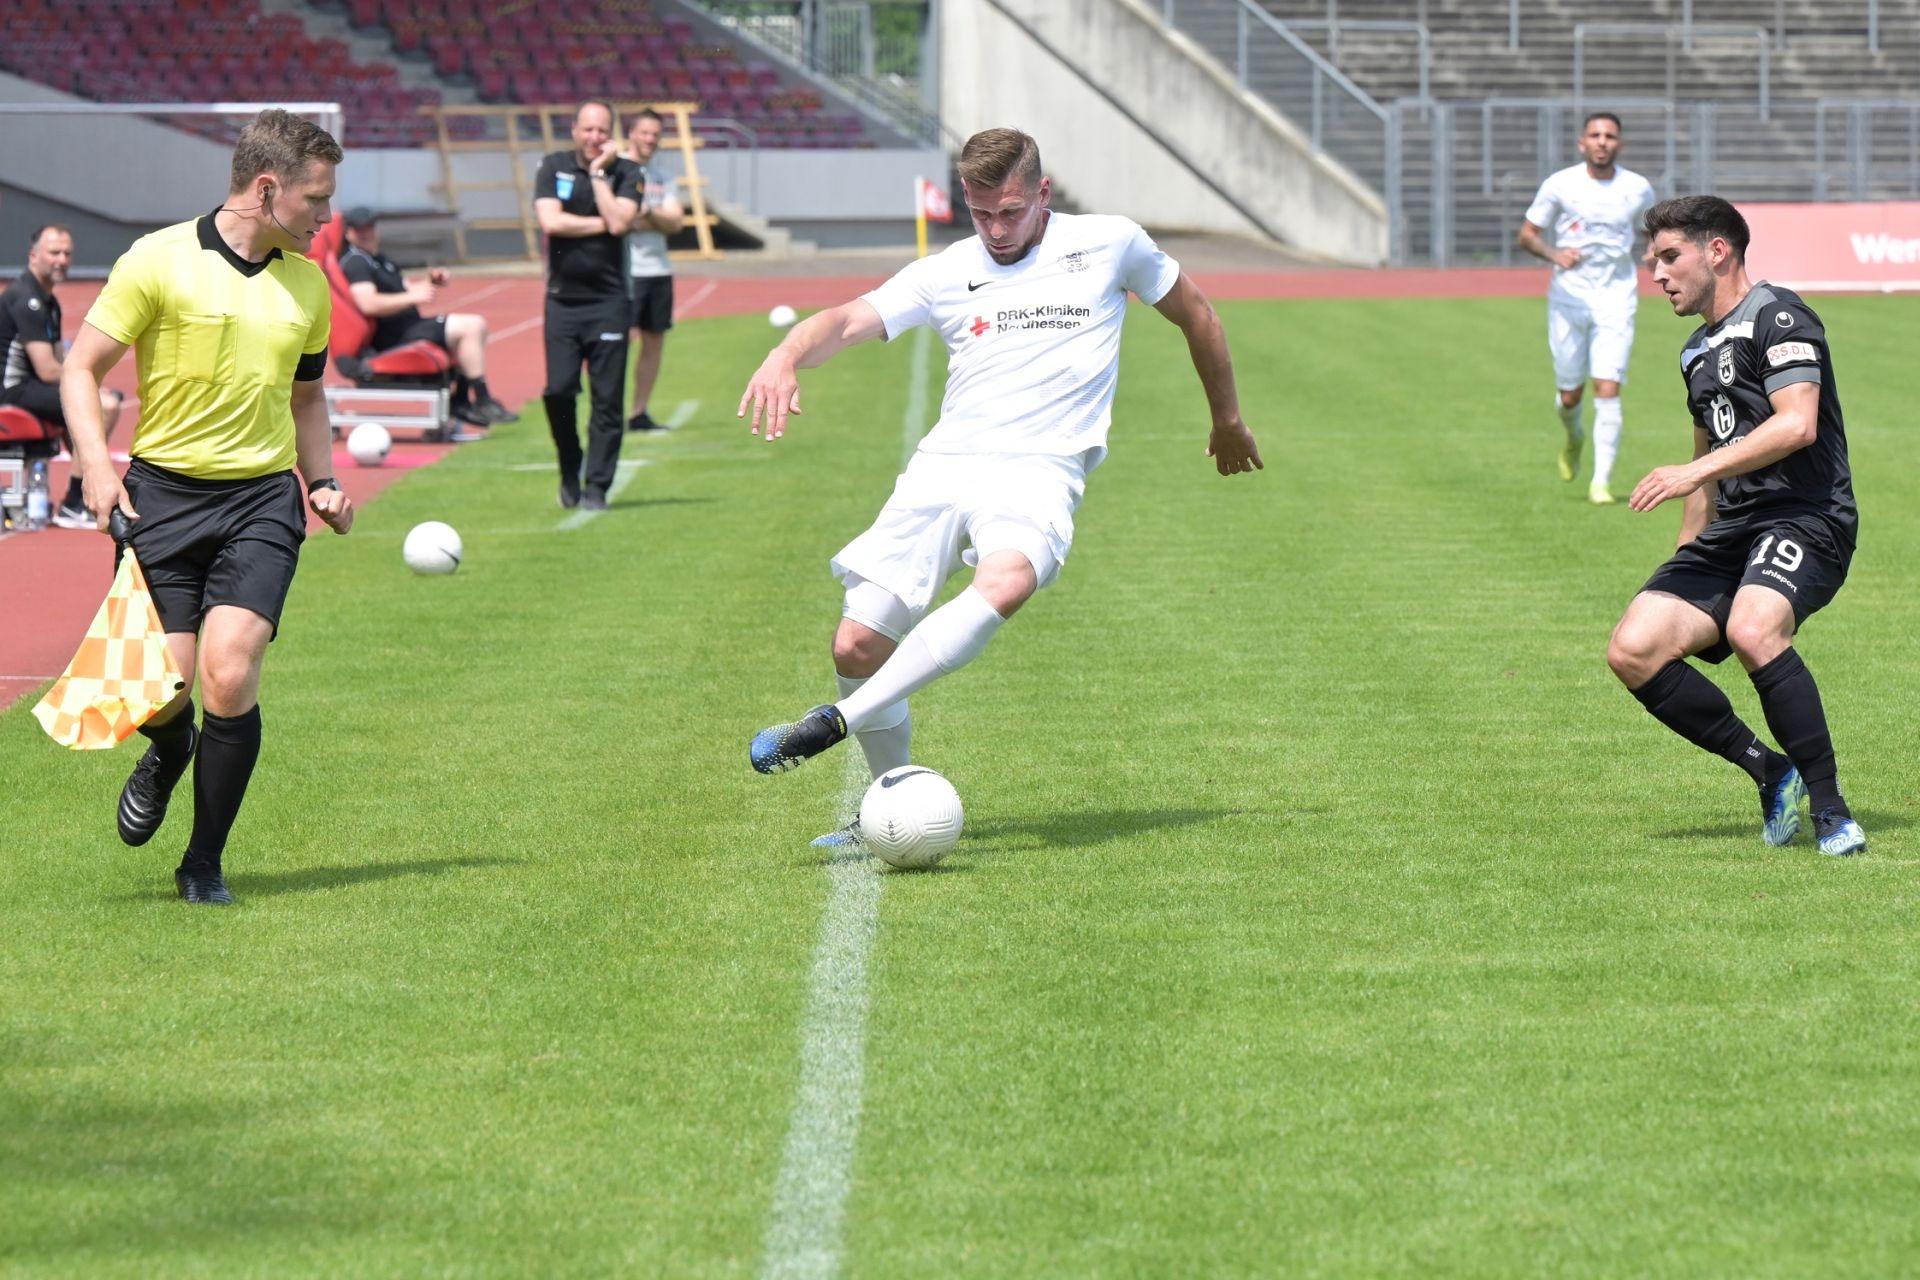 Regionalliga S�dwest 2020/21, KSV Hessen Kassel, SSV Ulm 1846, Endstand 3:1